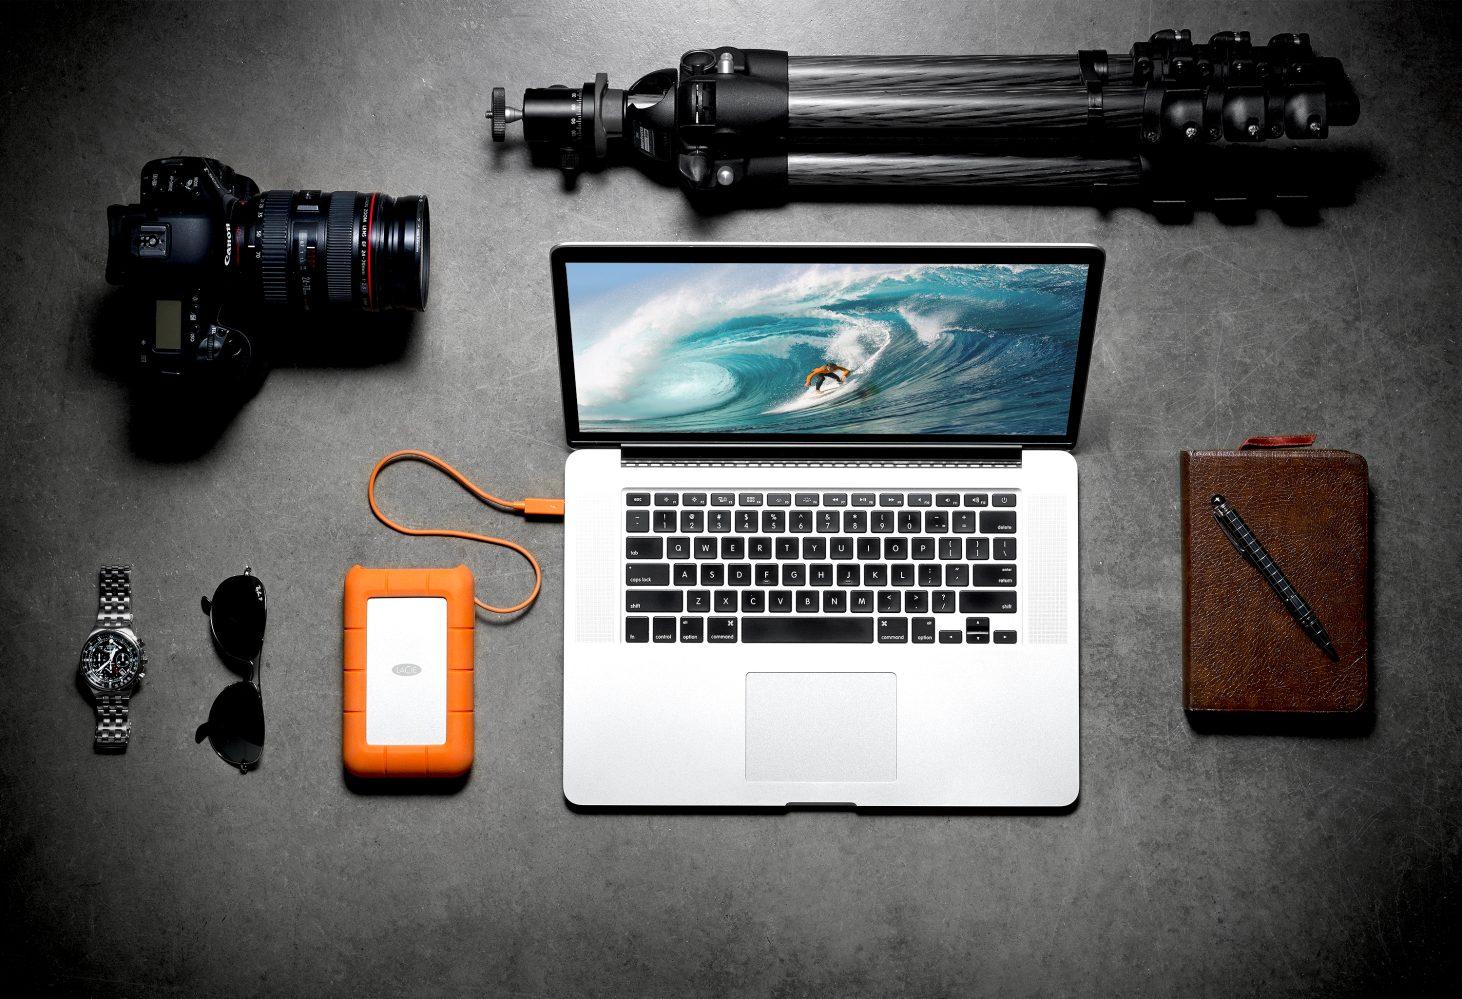 Review Lacie S 4tb Rugged Thunderbolt Usb 3 Portable Hard